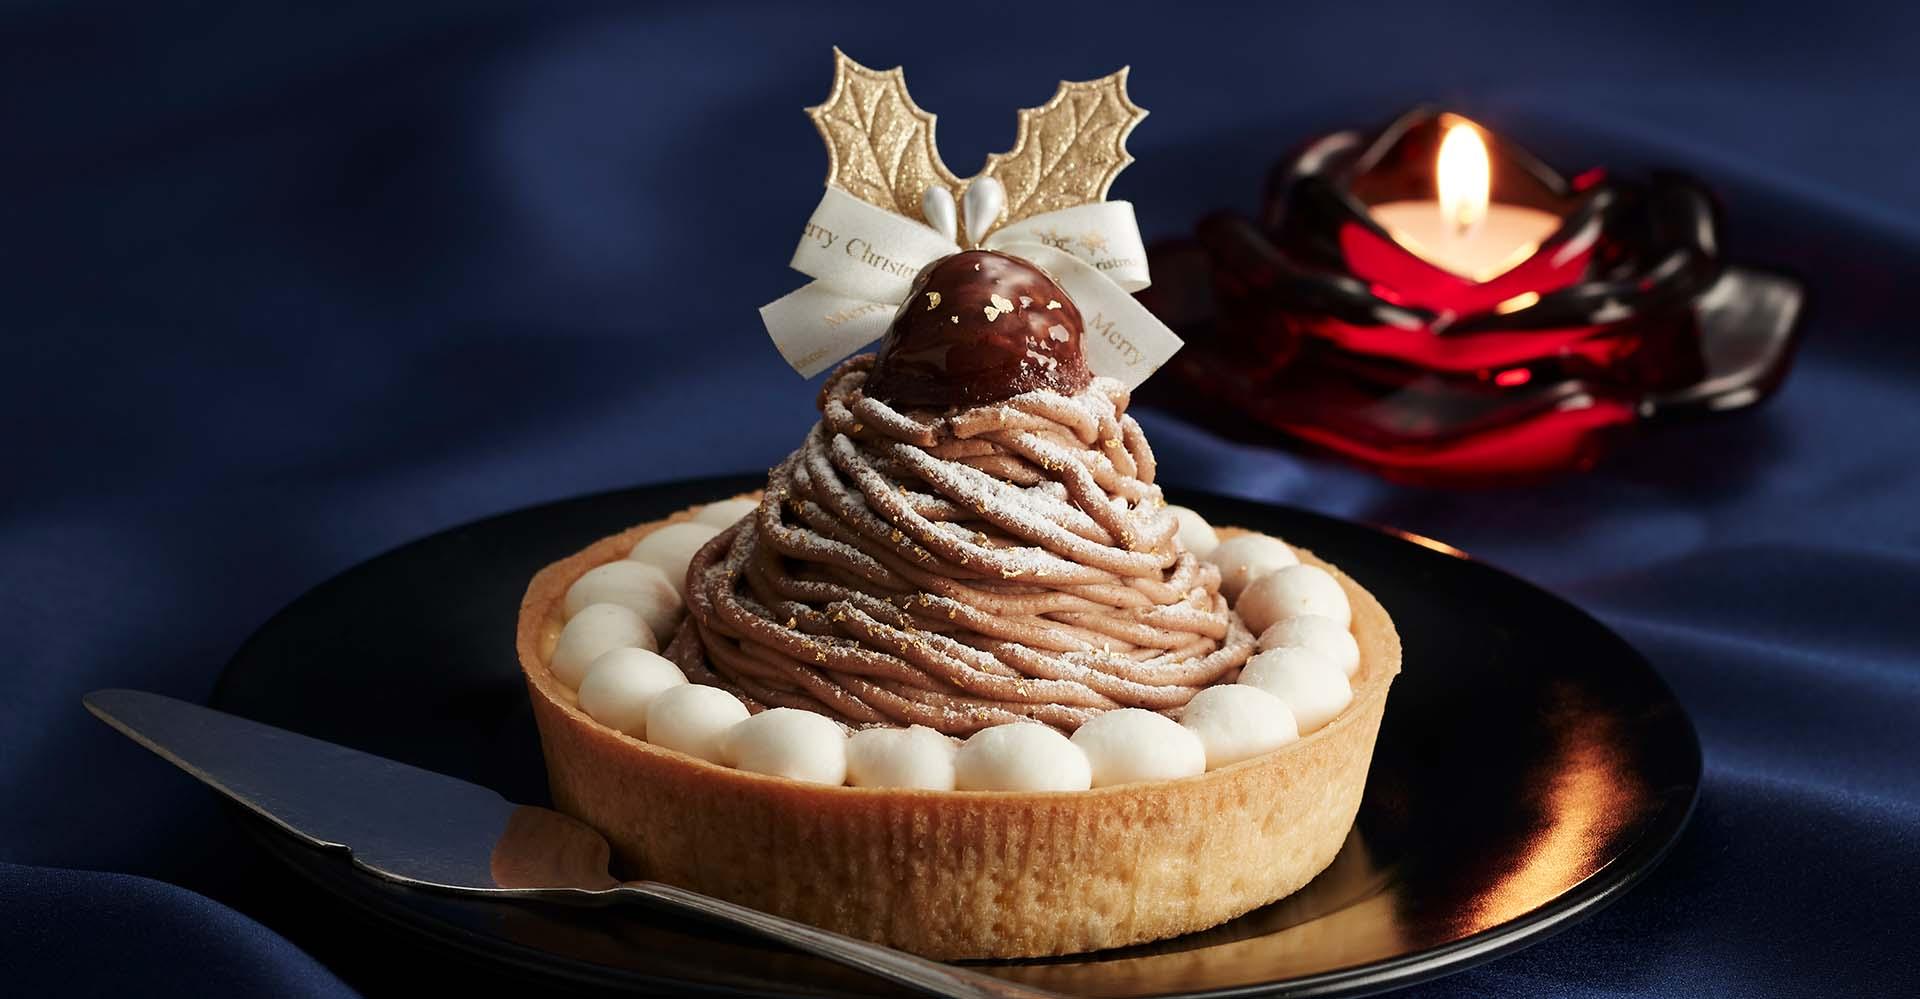 CHRISTMAS MONT BLANC CHEESE CAKE